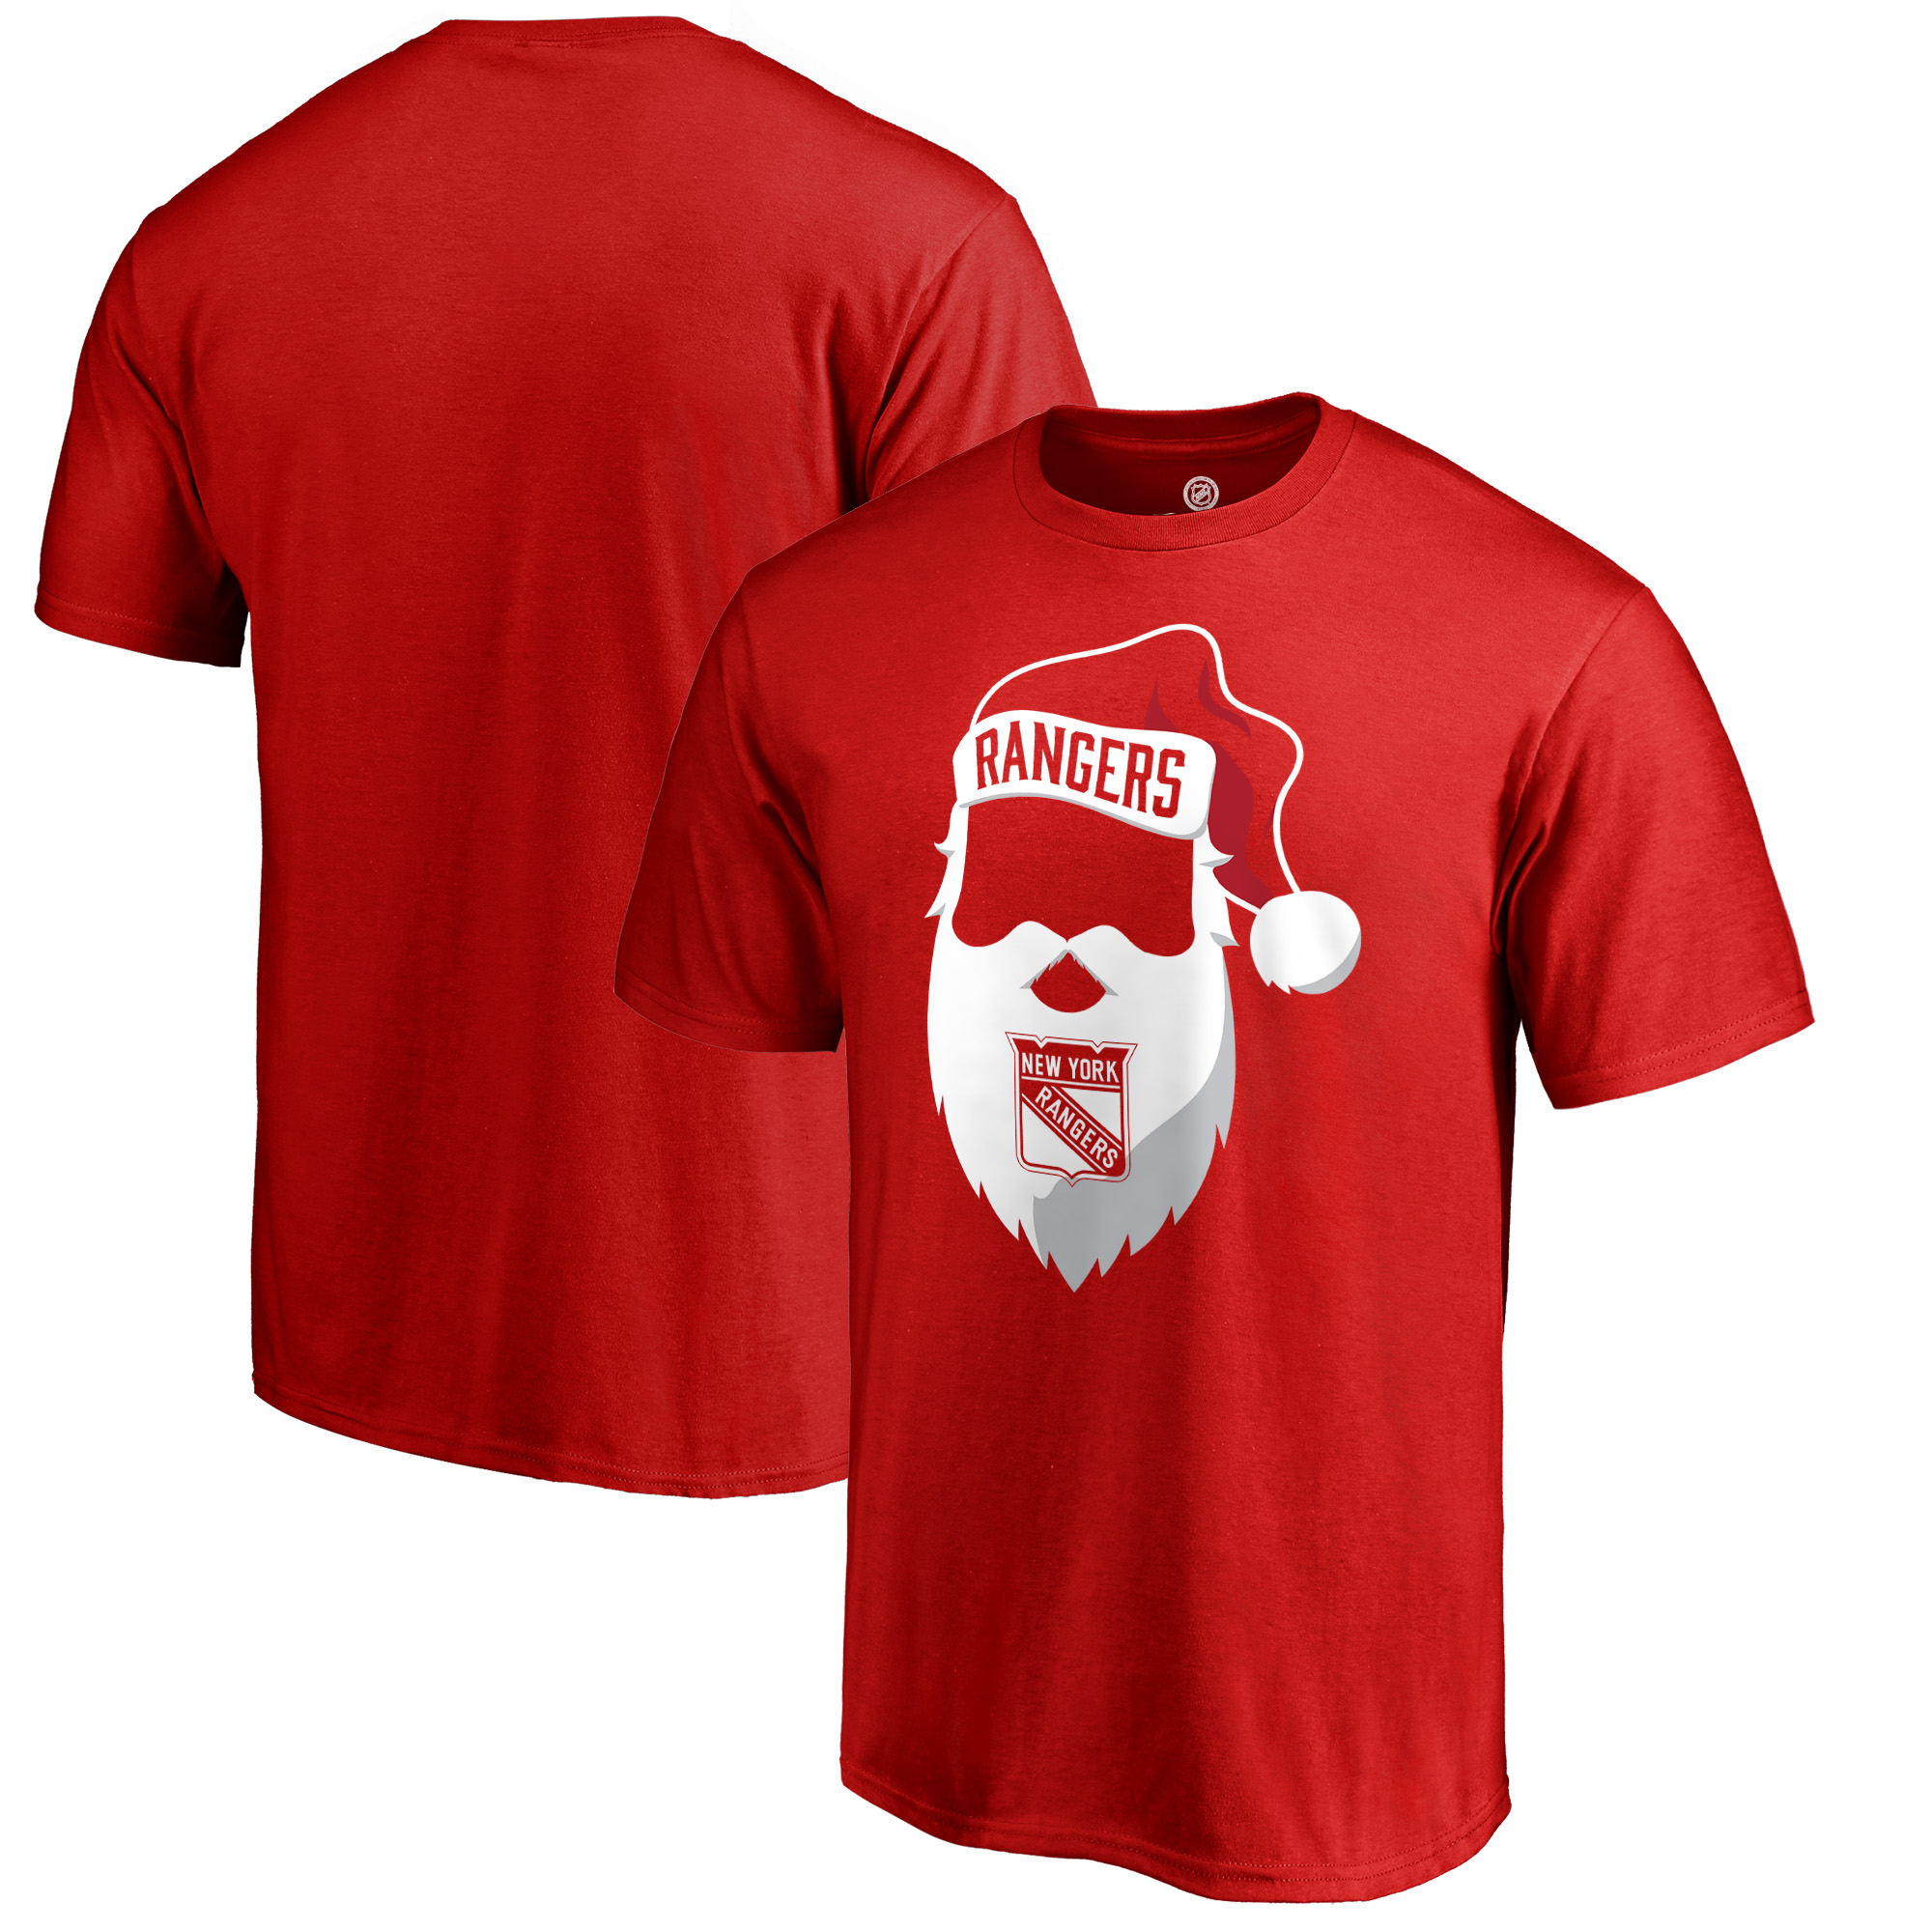 New York Rangers Fanatics Branded Jolly T-Shirt - Red